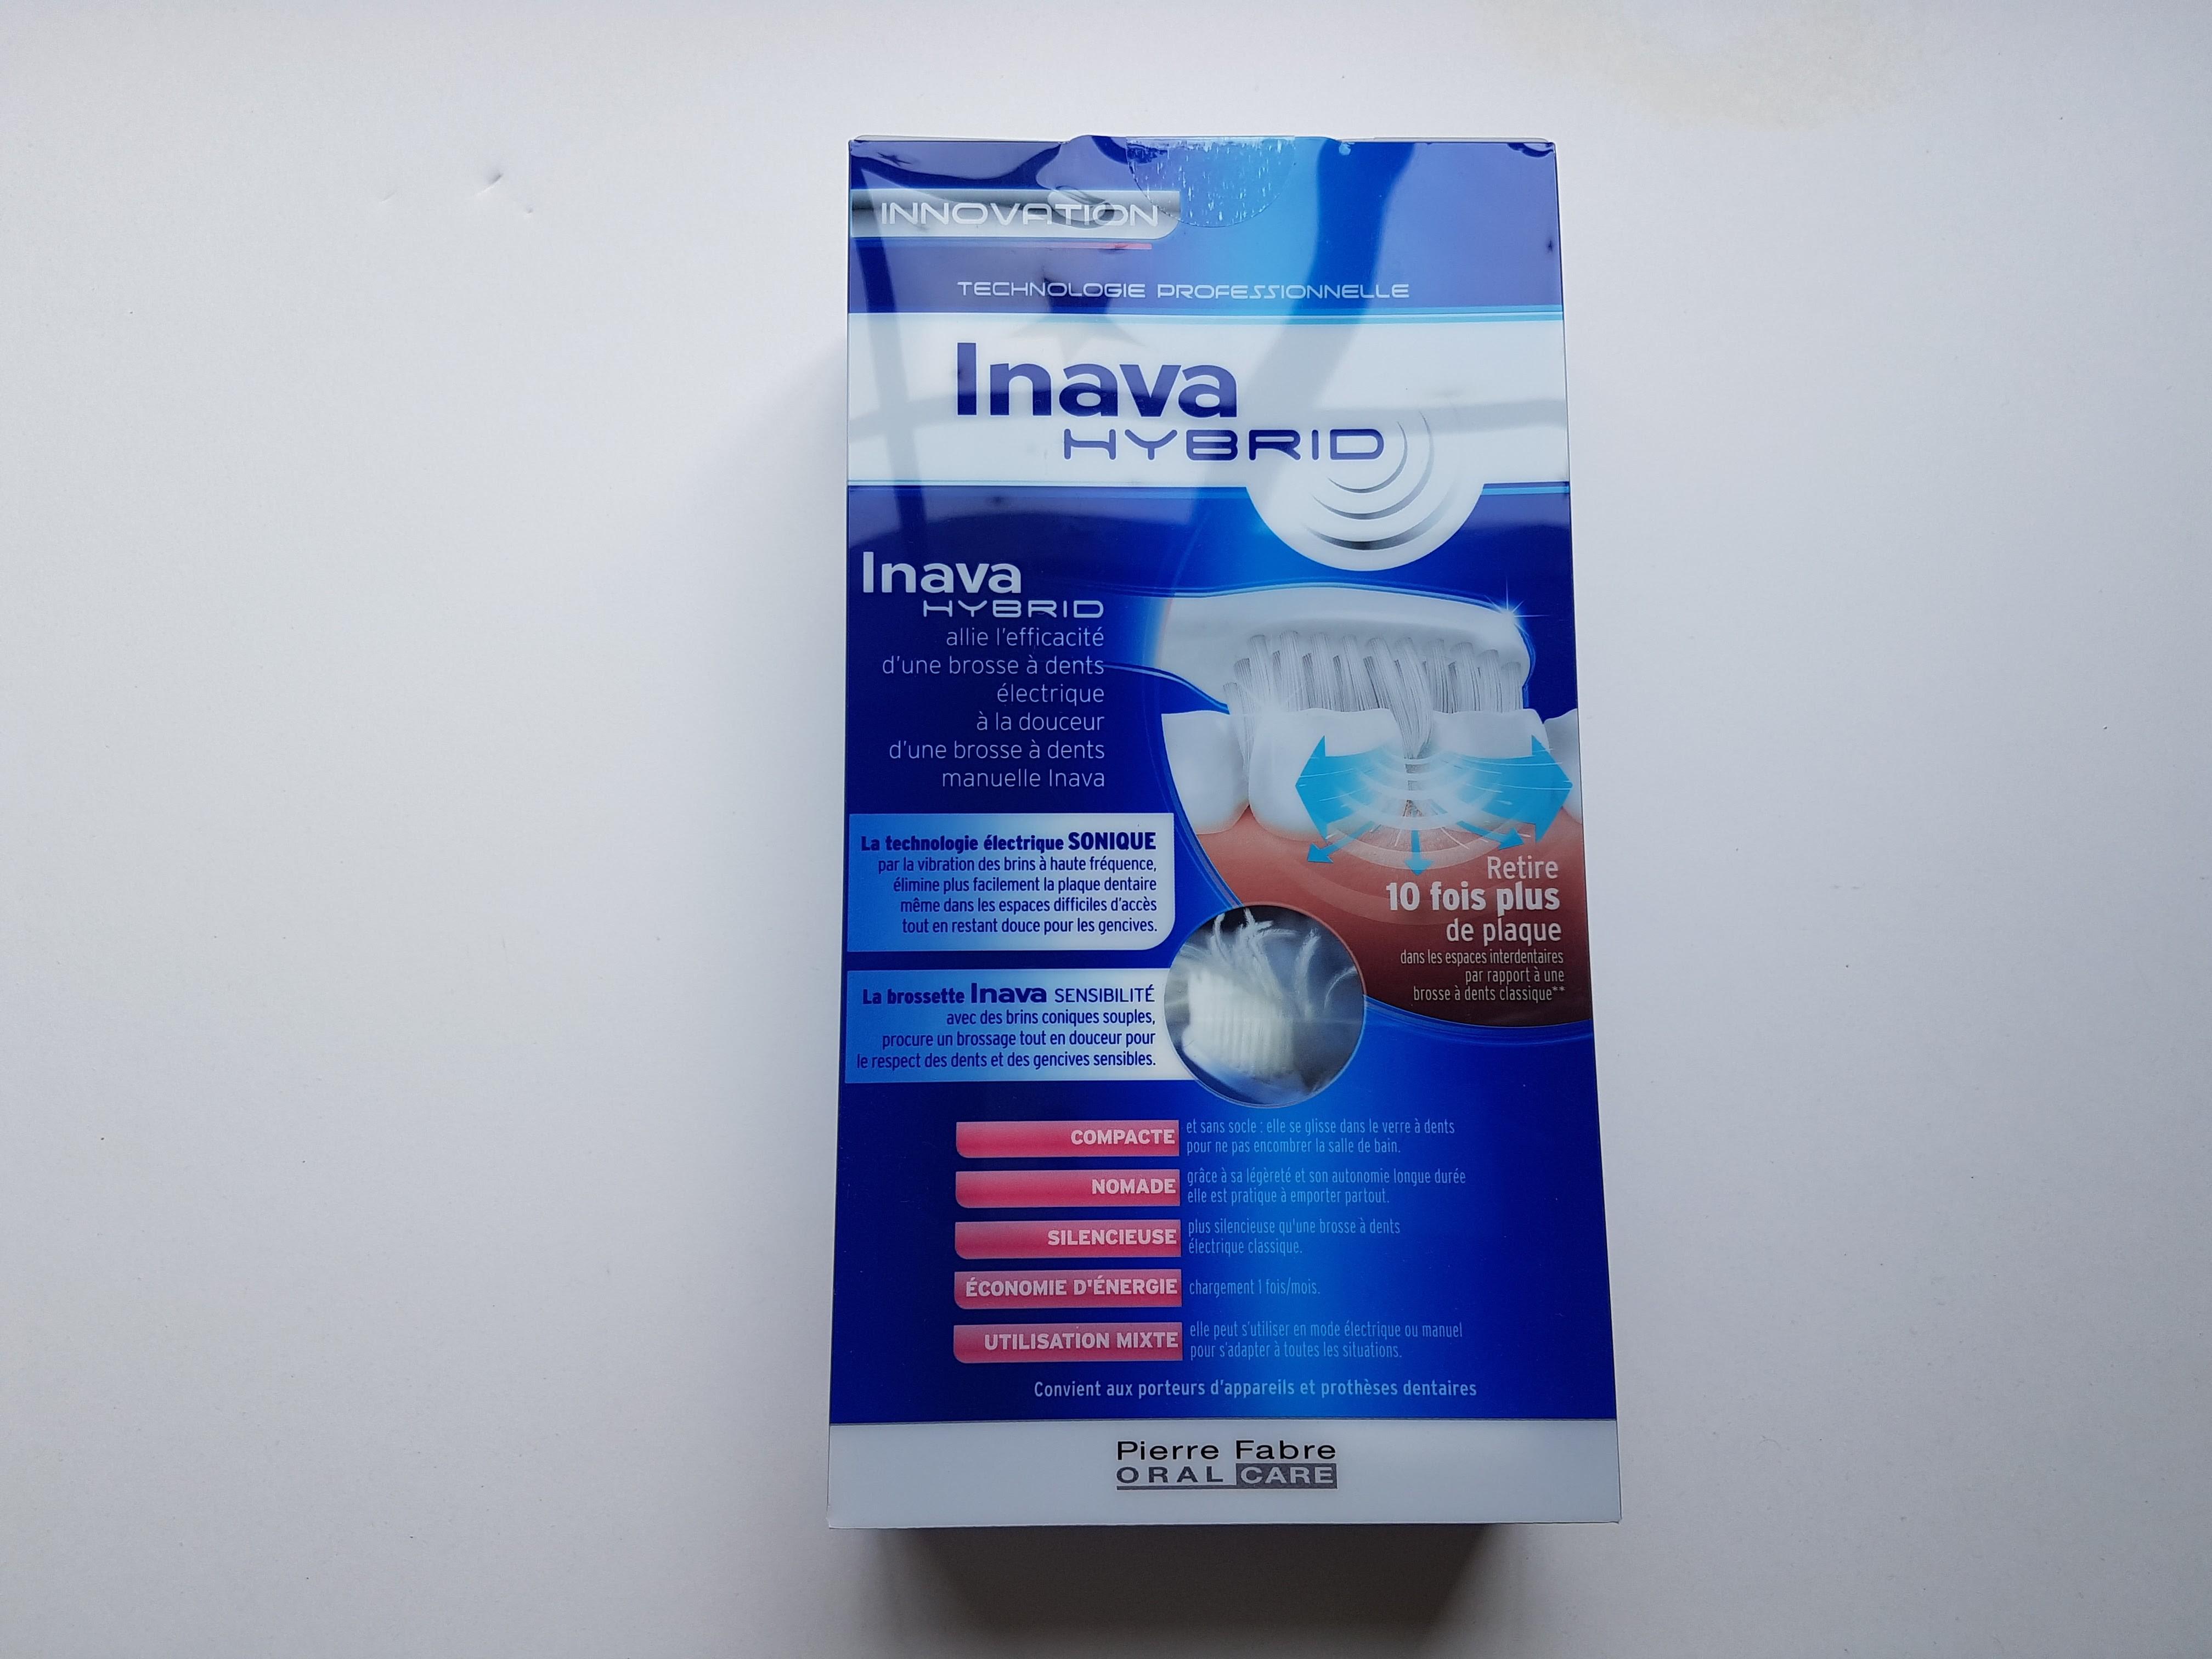 Inava-Hybrid - Inava-Hybrid-3.jpg